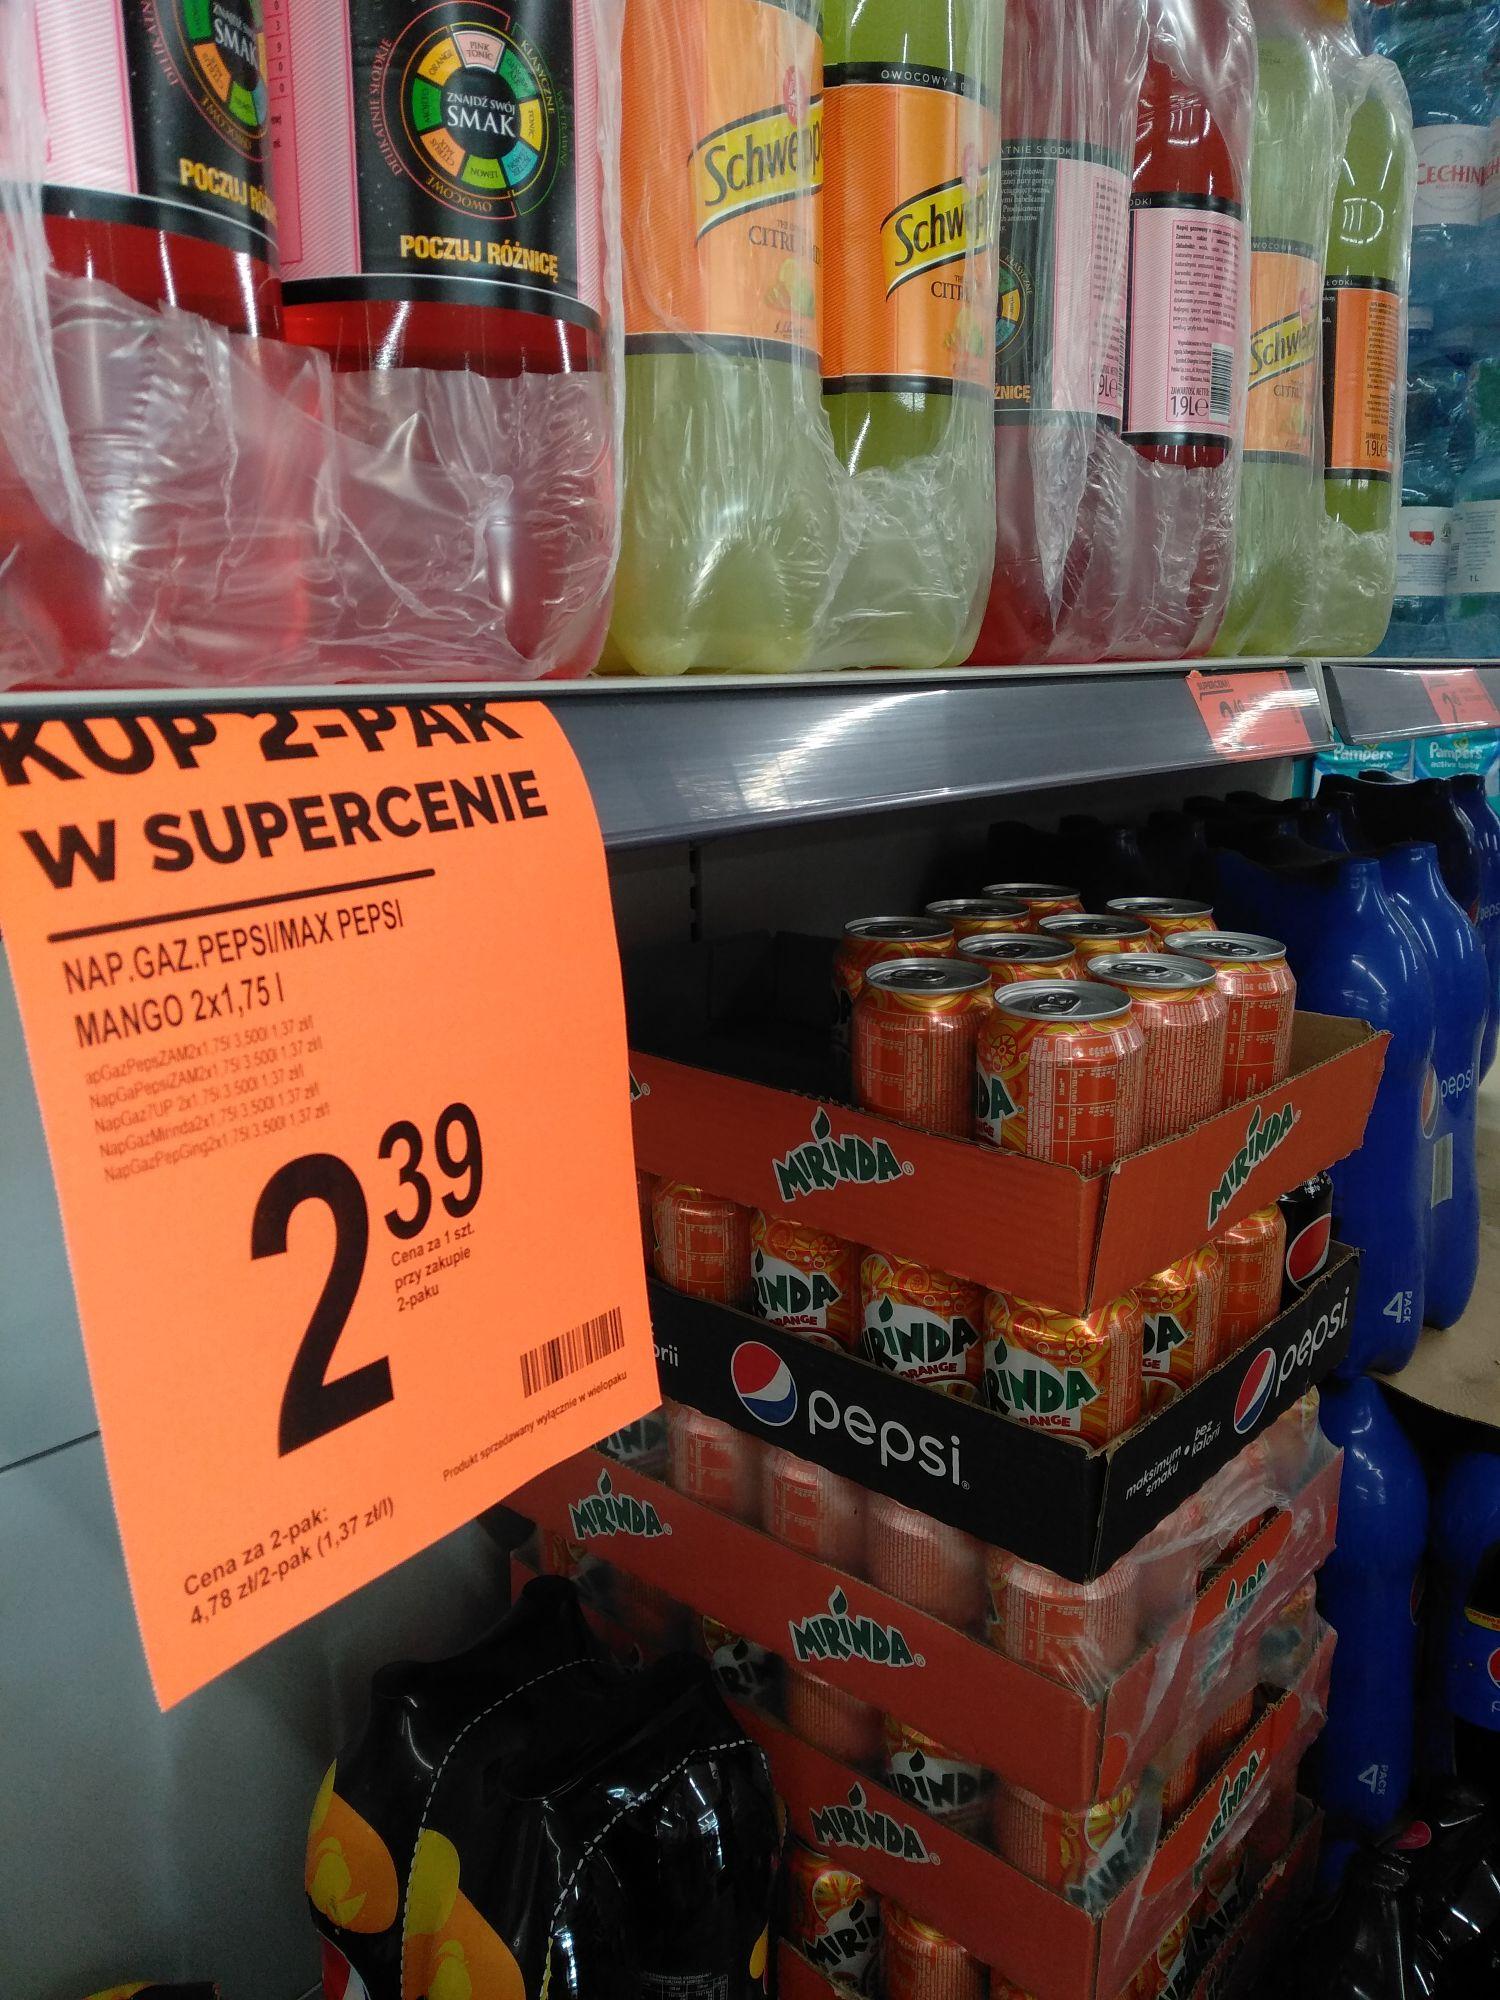 Biedronka, Pepsi 1.75l za 2.39zł w dwu paku